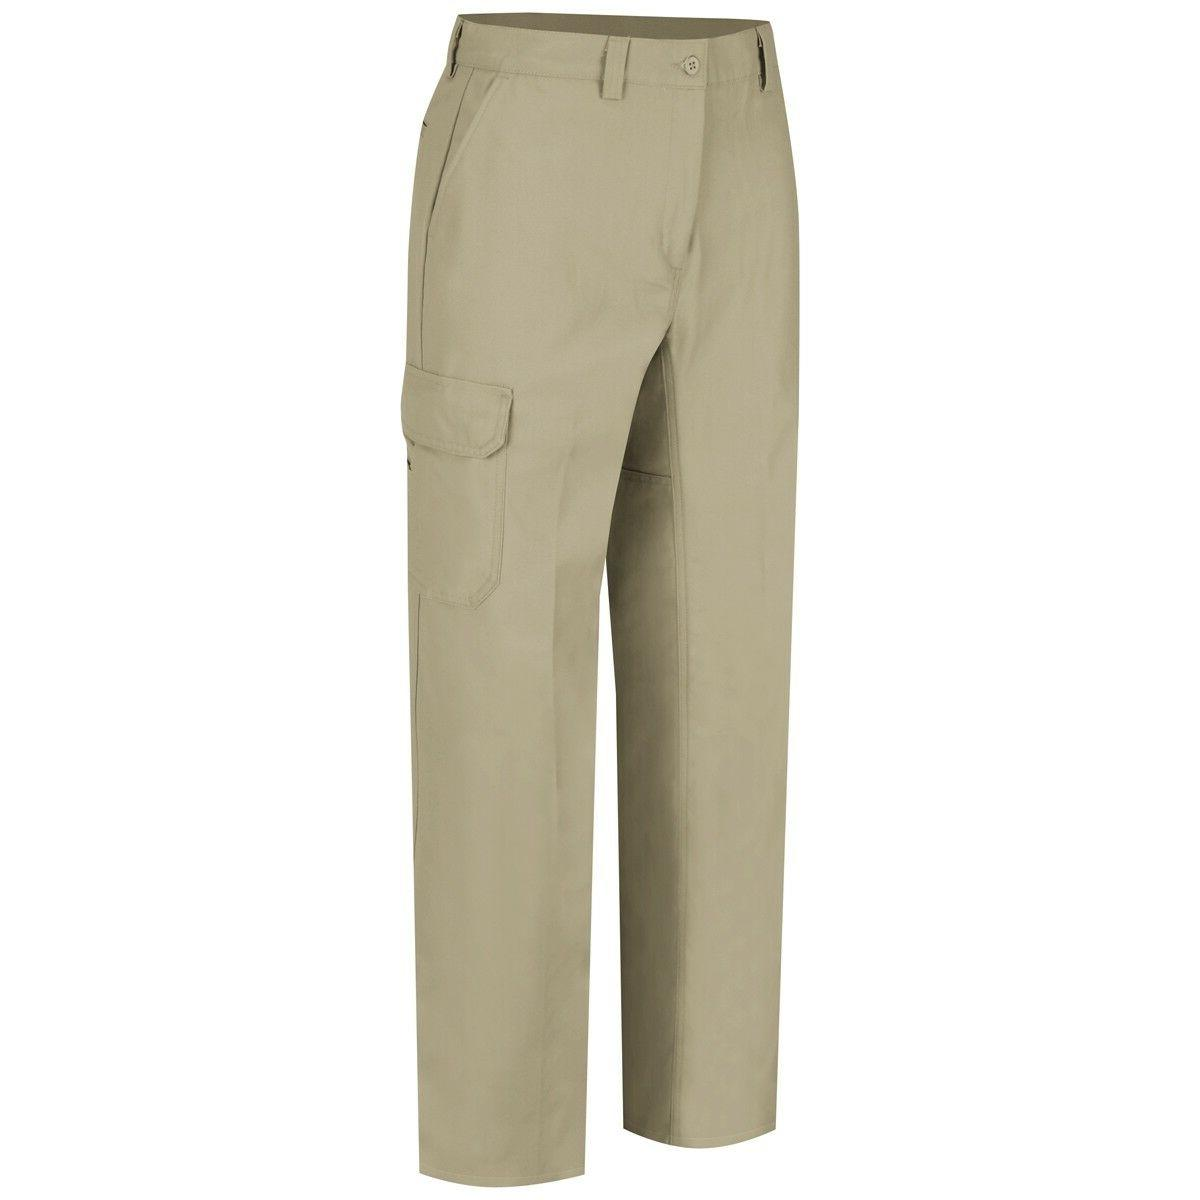 Wrangler Mens Functional Cargo Work Pants, Khaki